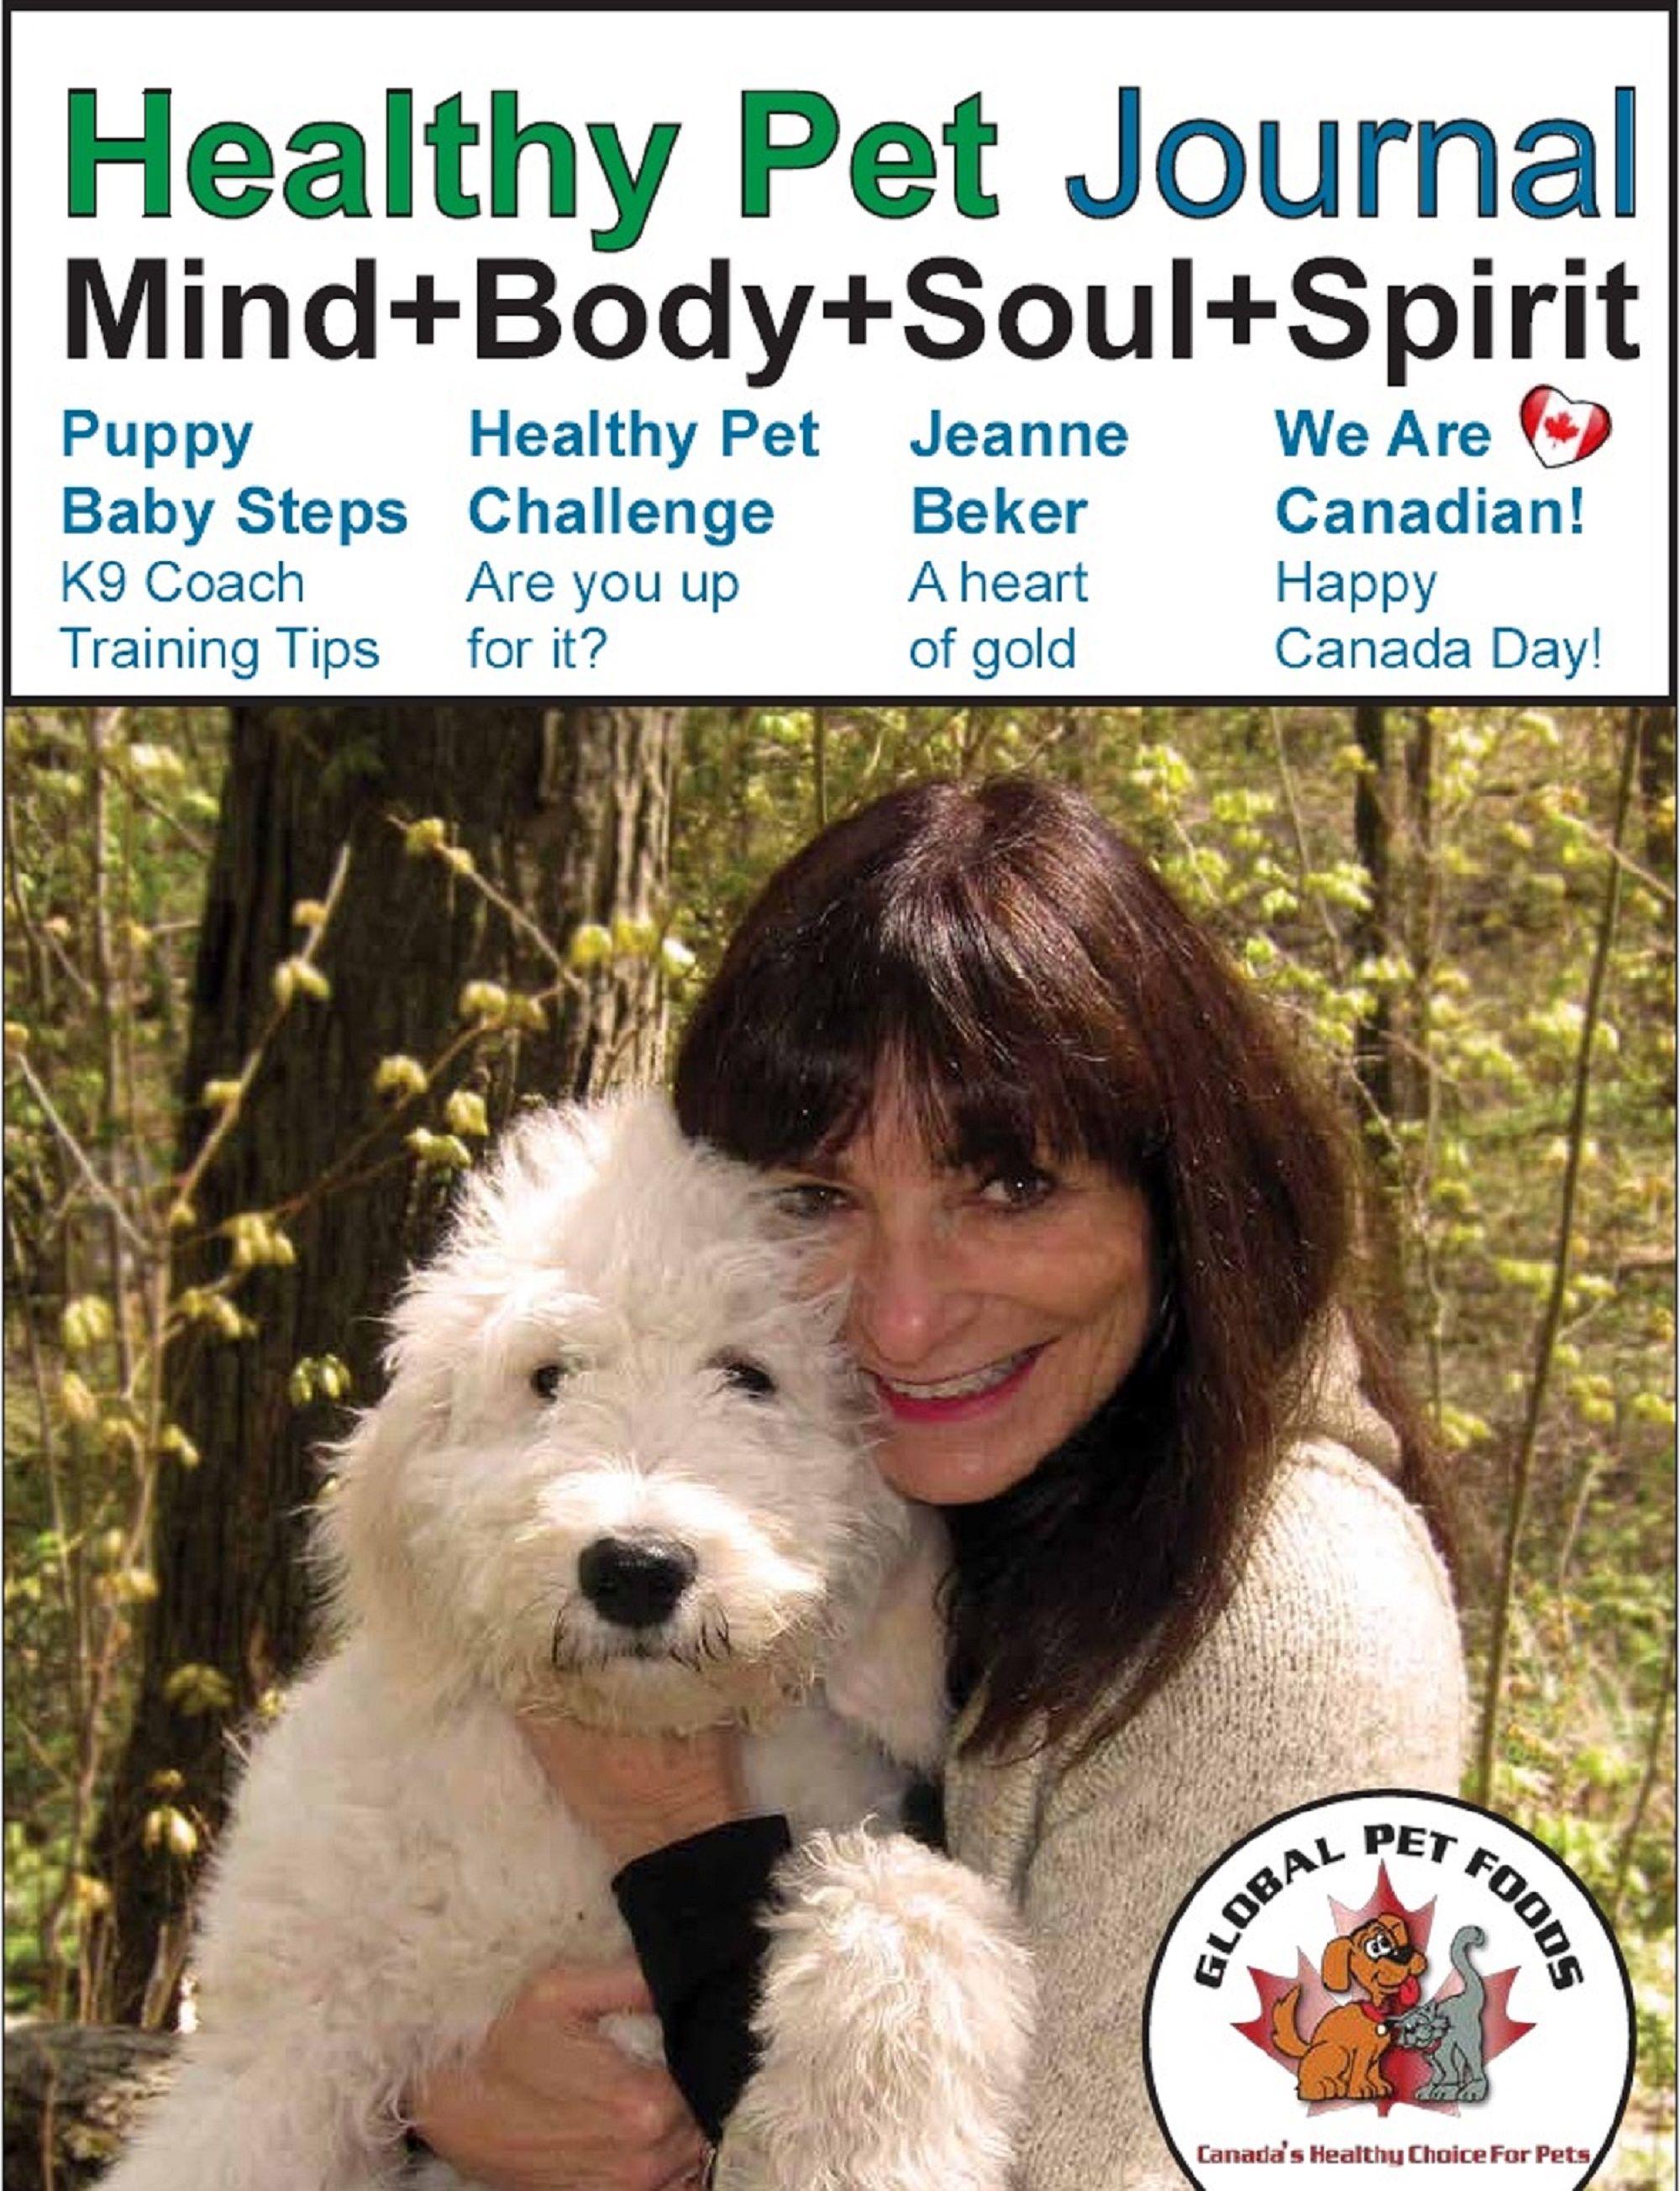 Global Pet Foods Healthy Pet Journal Summer 2013 Healthy Pets